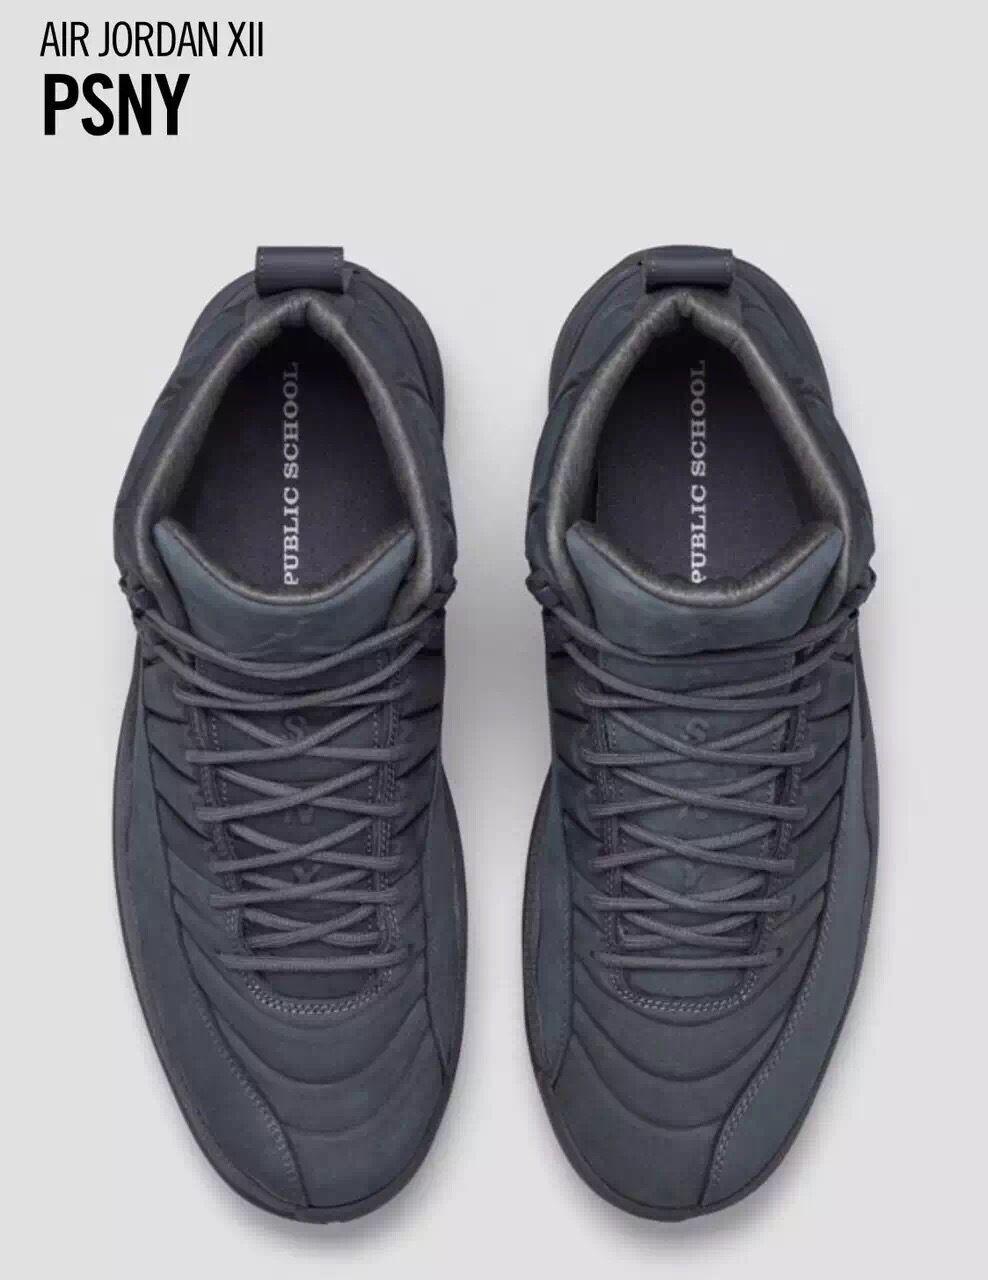 de1cbe0e95dc Buy Nike Air Jordan 12 PSNY Public School 2015 Retro DS Size 11.5 US XII  130690 003 online